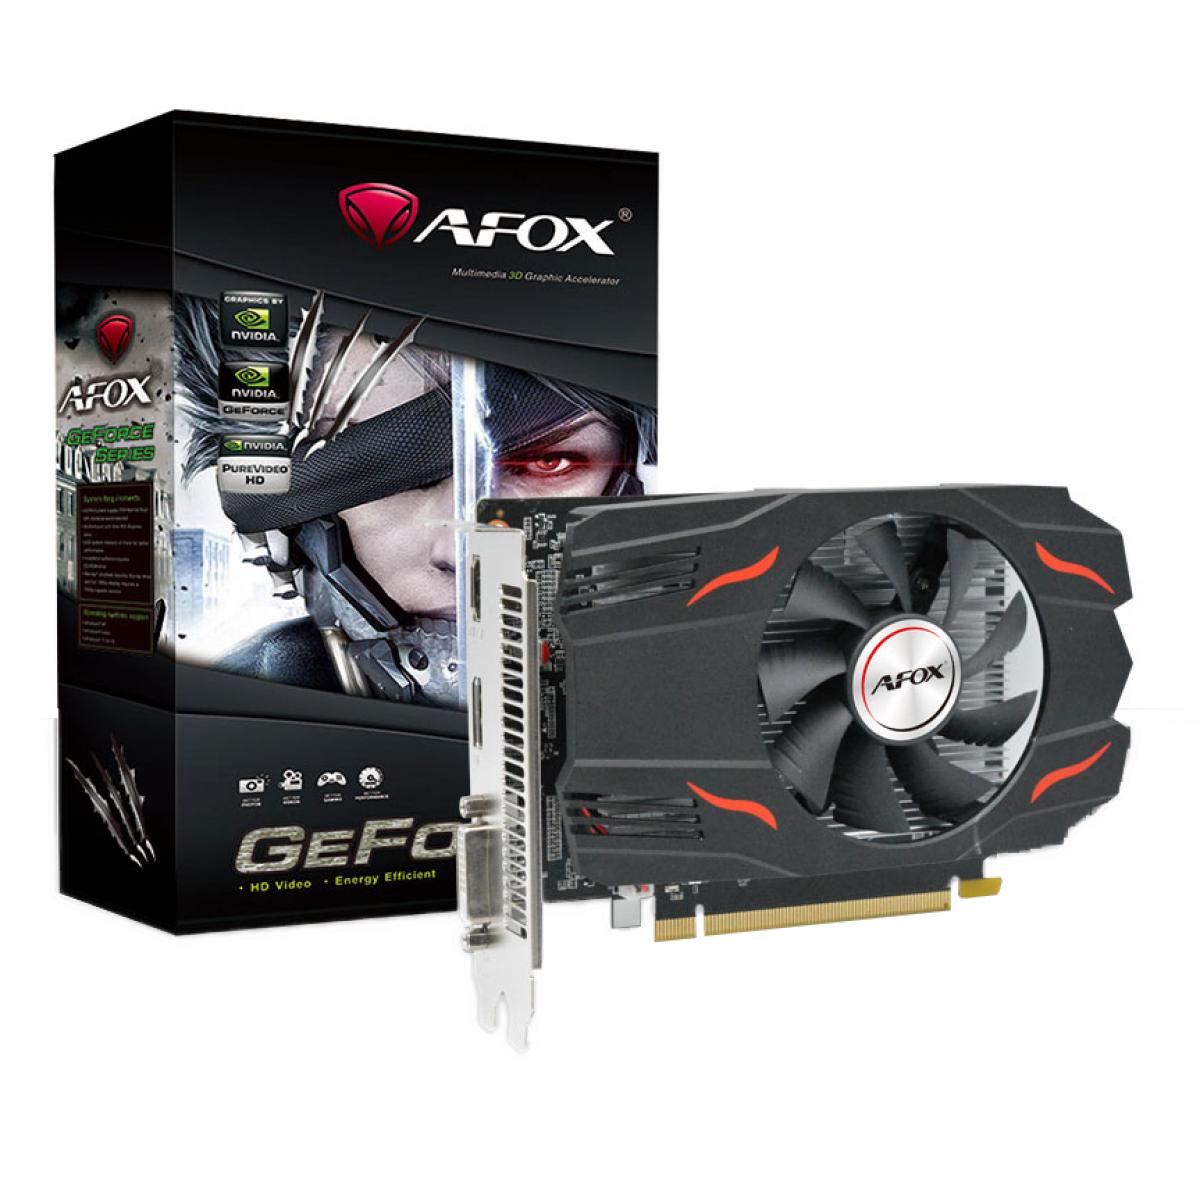 Placa de Vídeo Afox, GeForce, GTX 1650 SUPER, 4GB GDDR6, 128Bit, AF1650S-4096D6H1